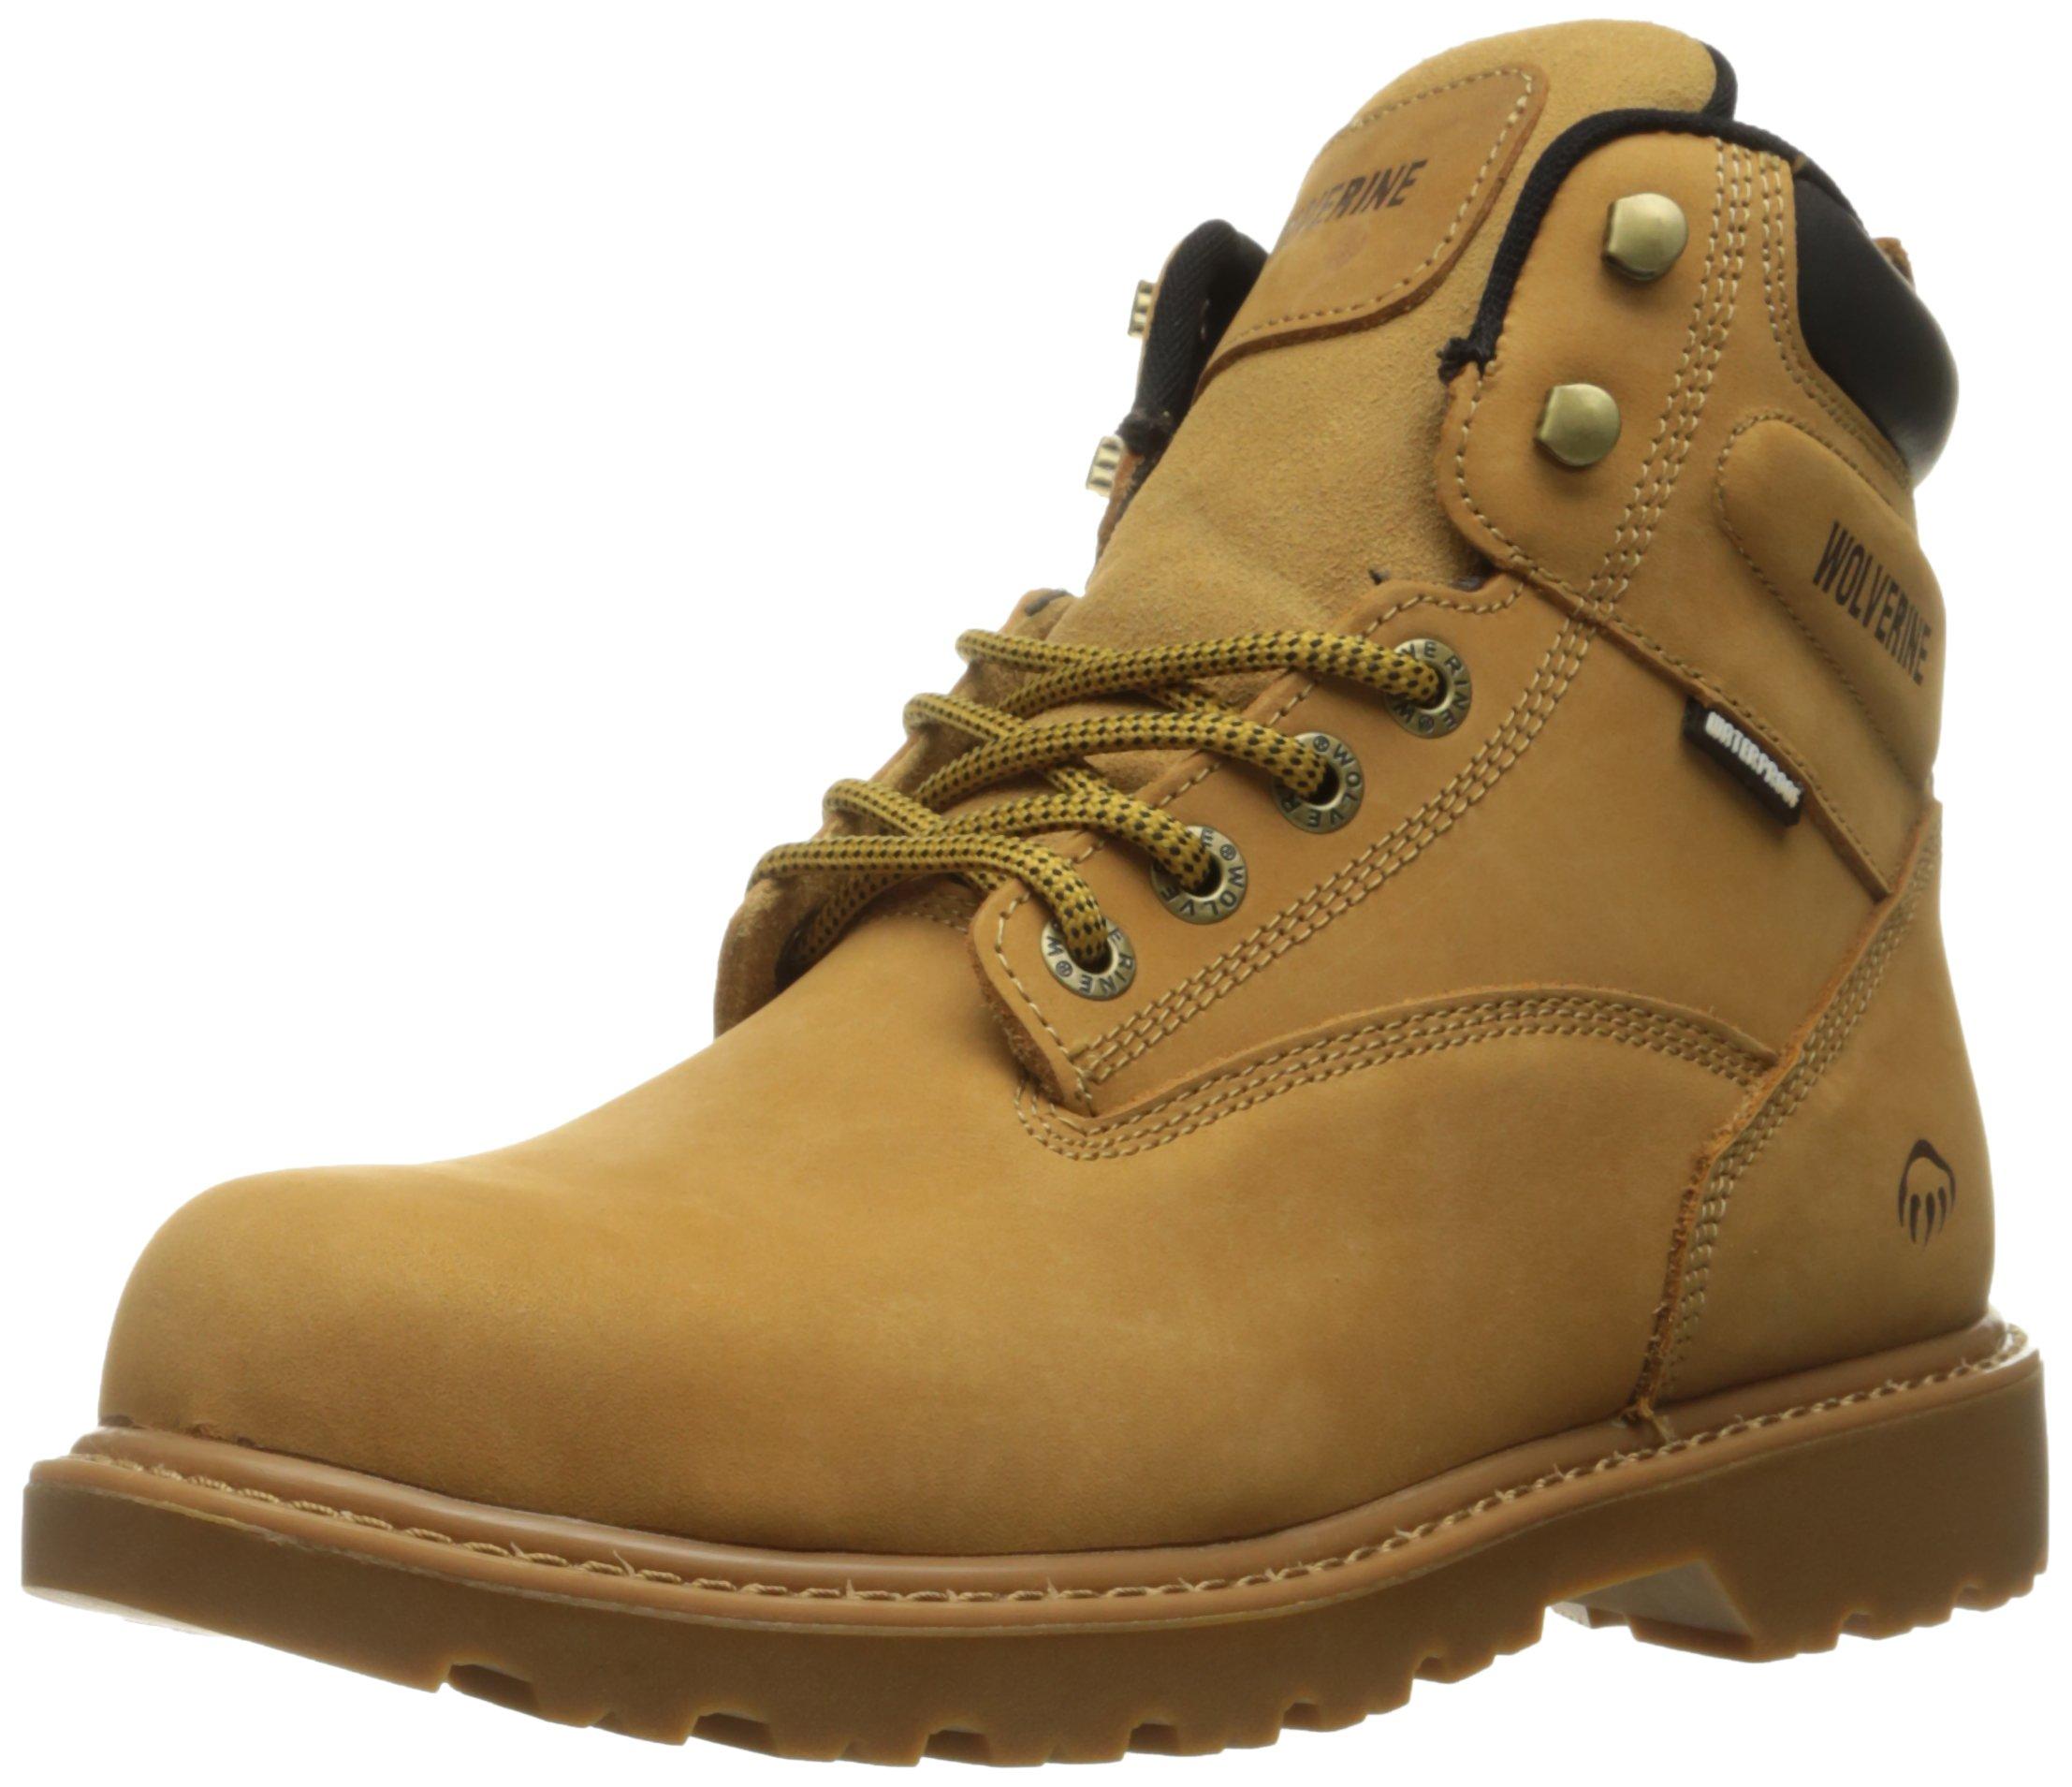 Wolverine Men's Floorhand 6 Inch Waterproof Steel Toe Work Shoe, Wheat, 14 M US